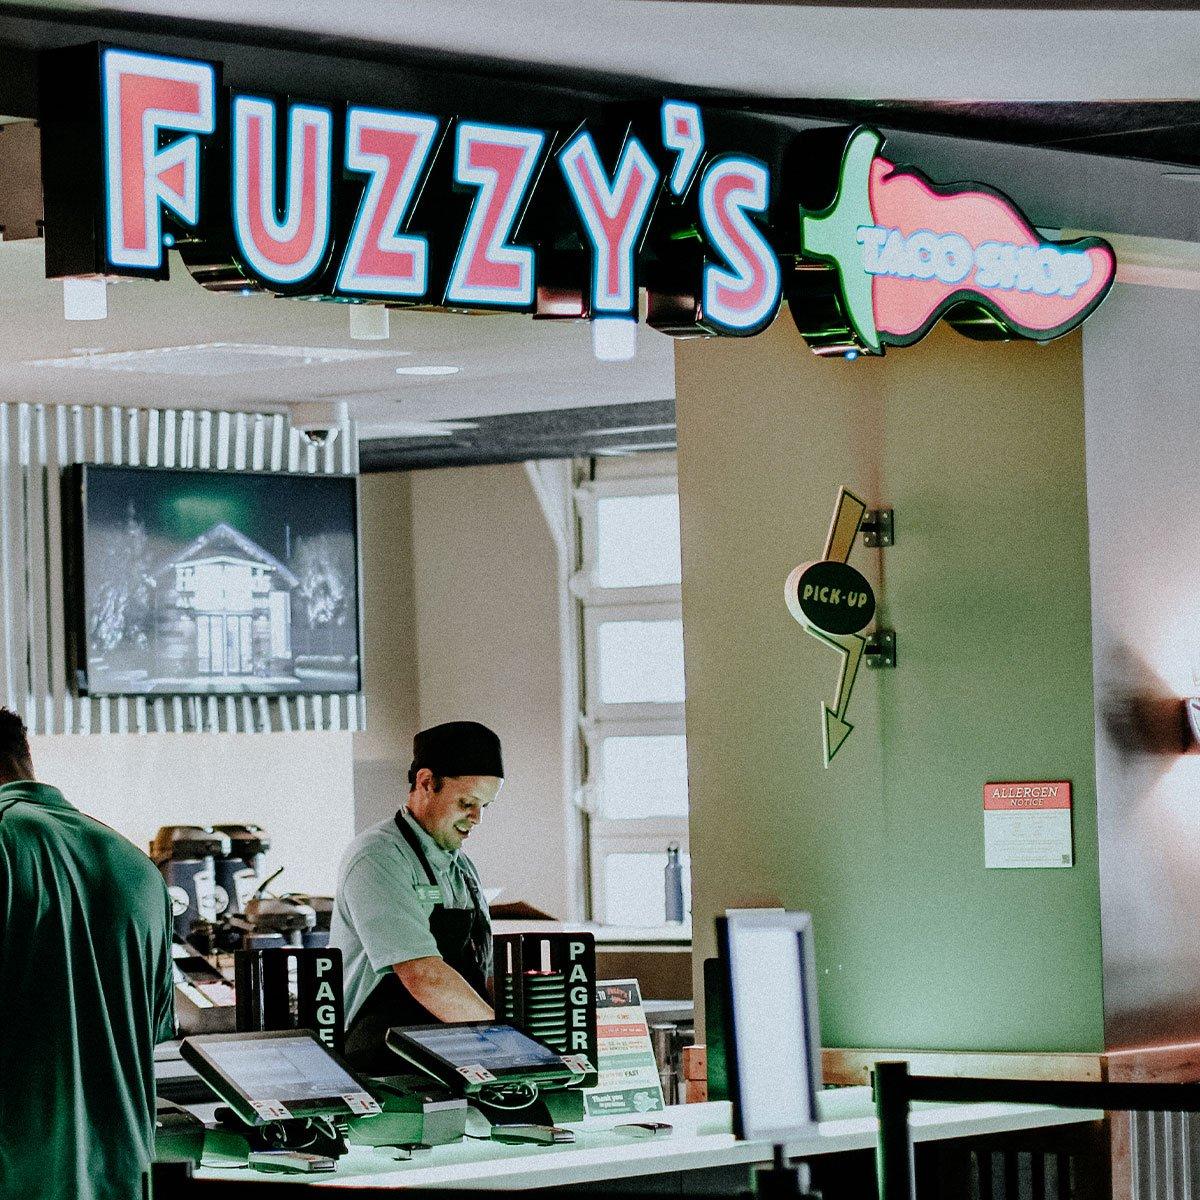 Fuzzy's taco shop storefront